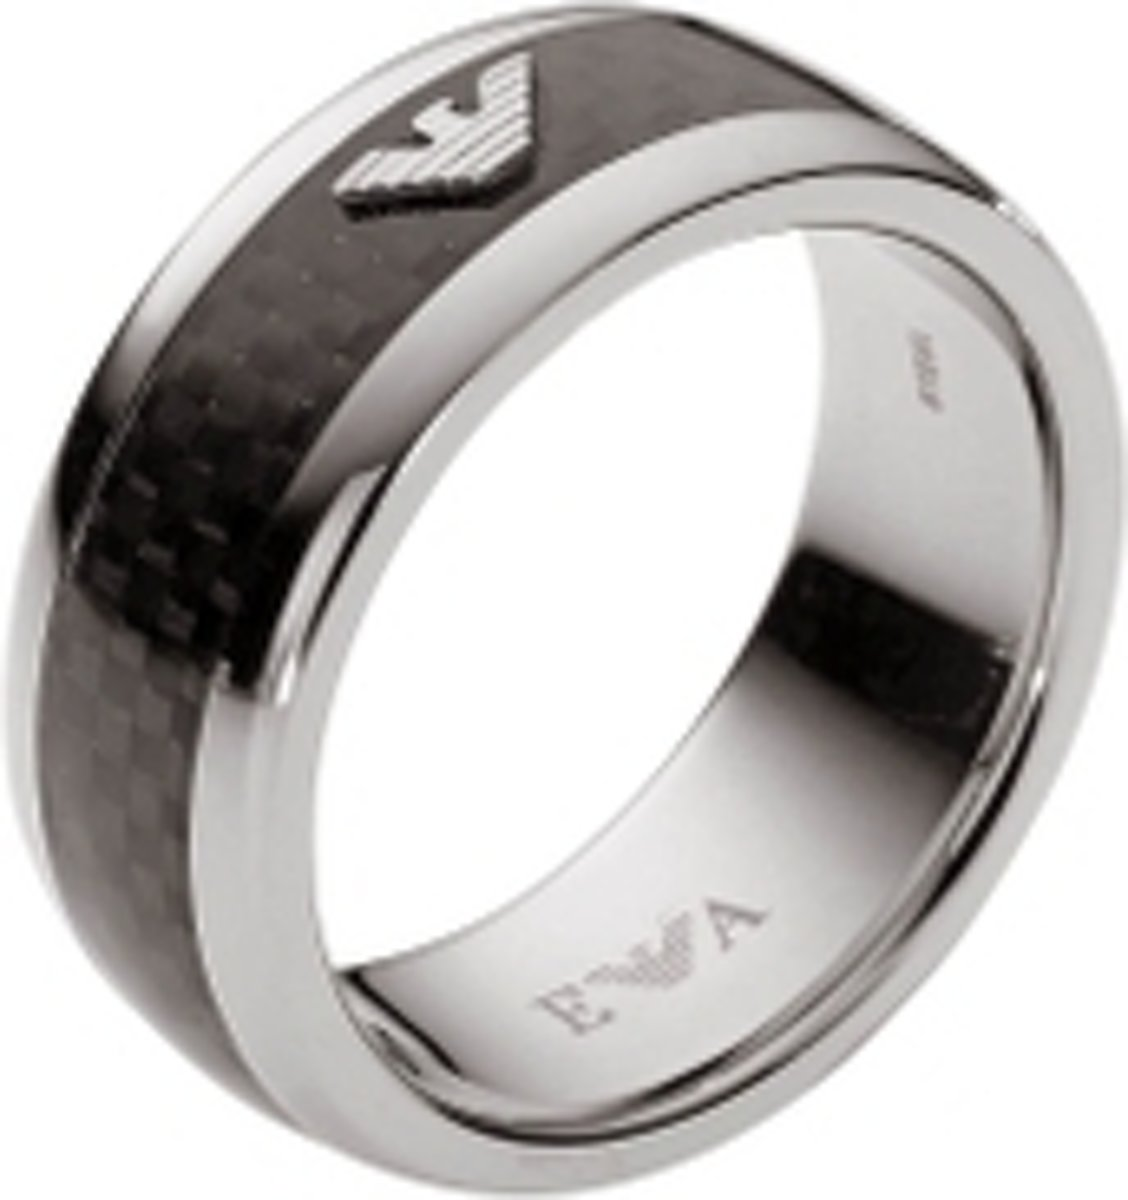 Emporio Armani Mannen Ring EGS1602040 kopen